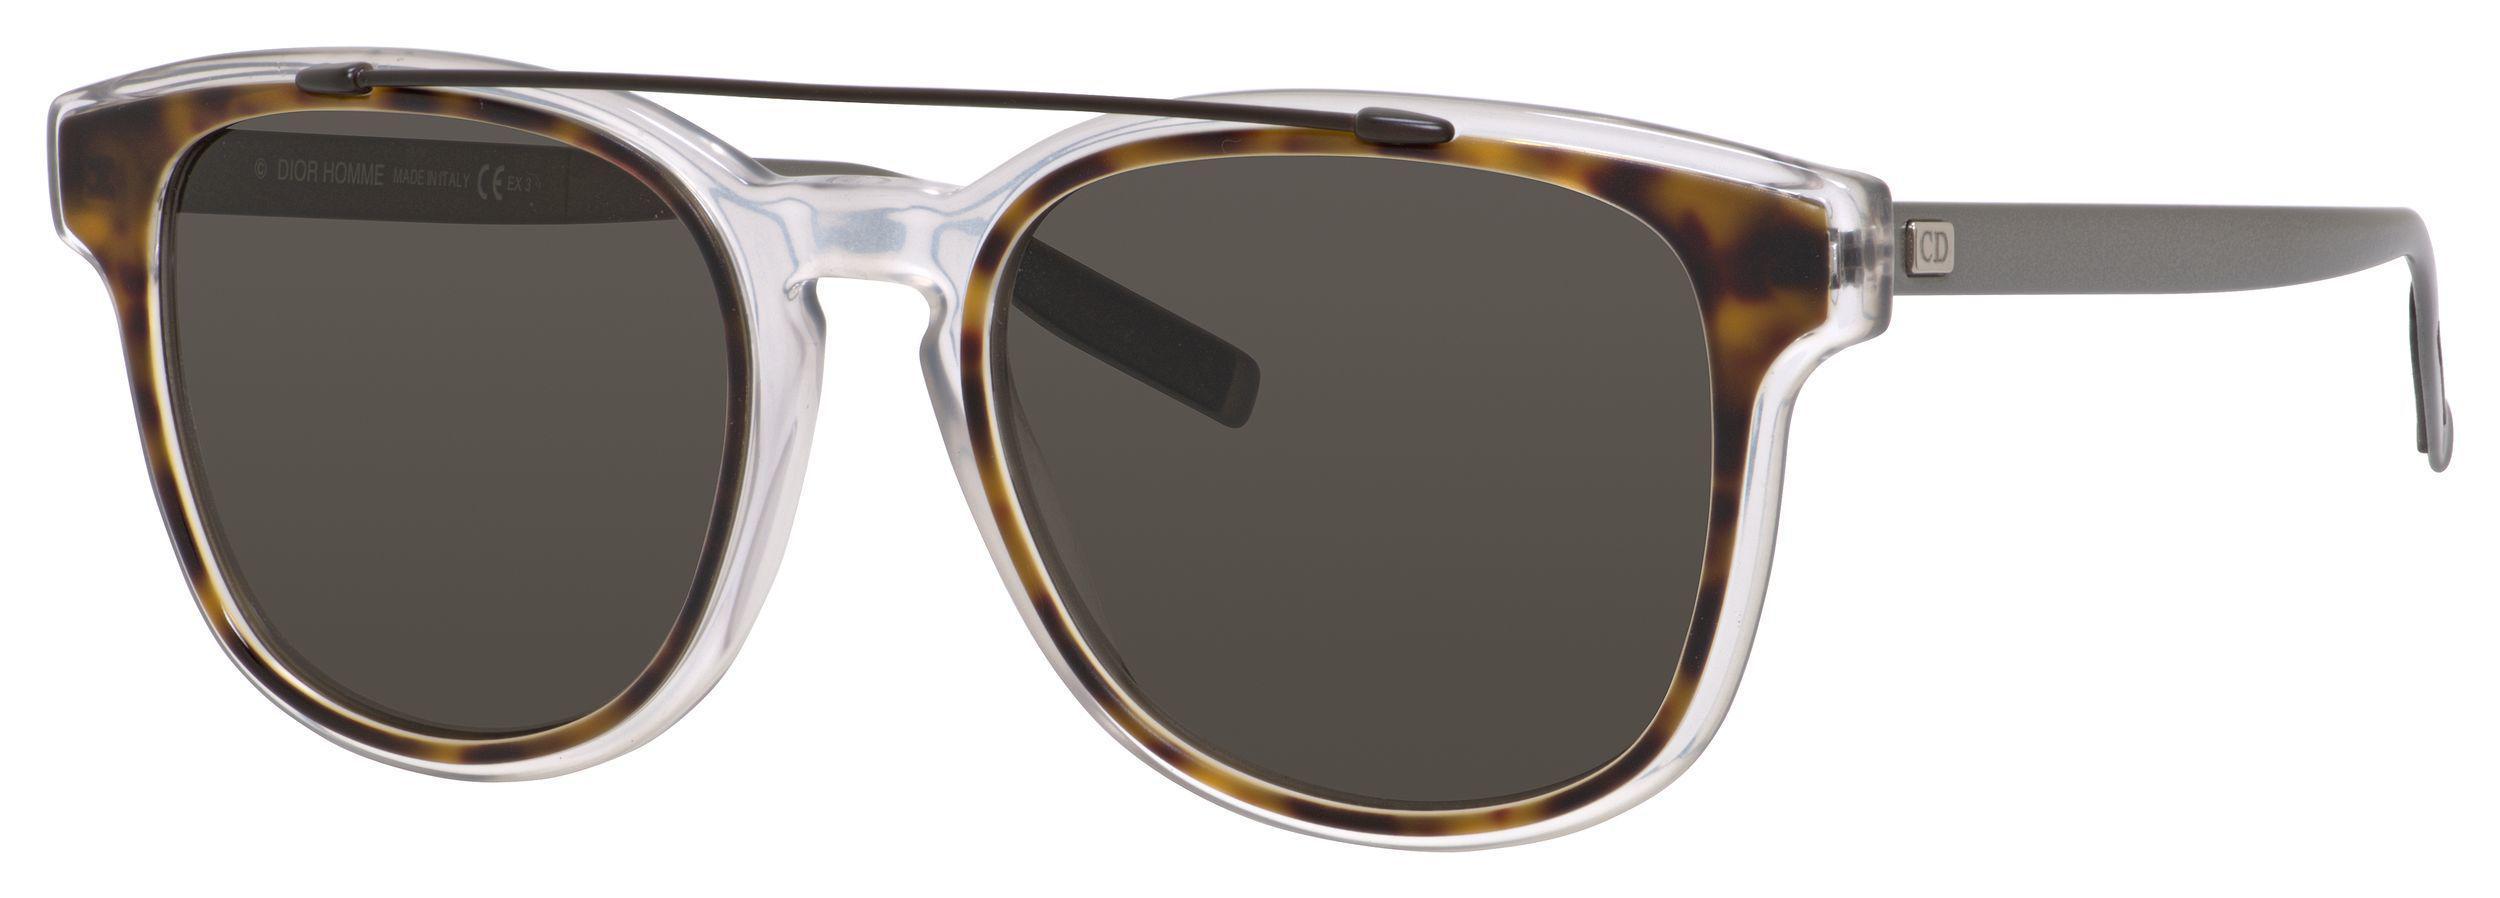 c93ae36a3250 Lyst - Dior Homme Blacktie 211 Square Sunglasses